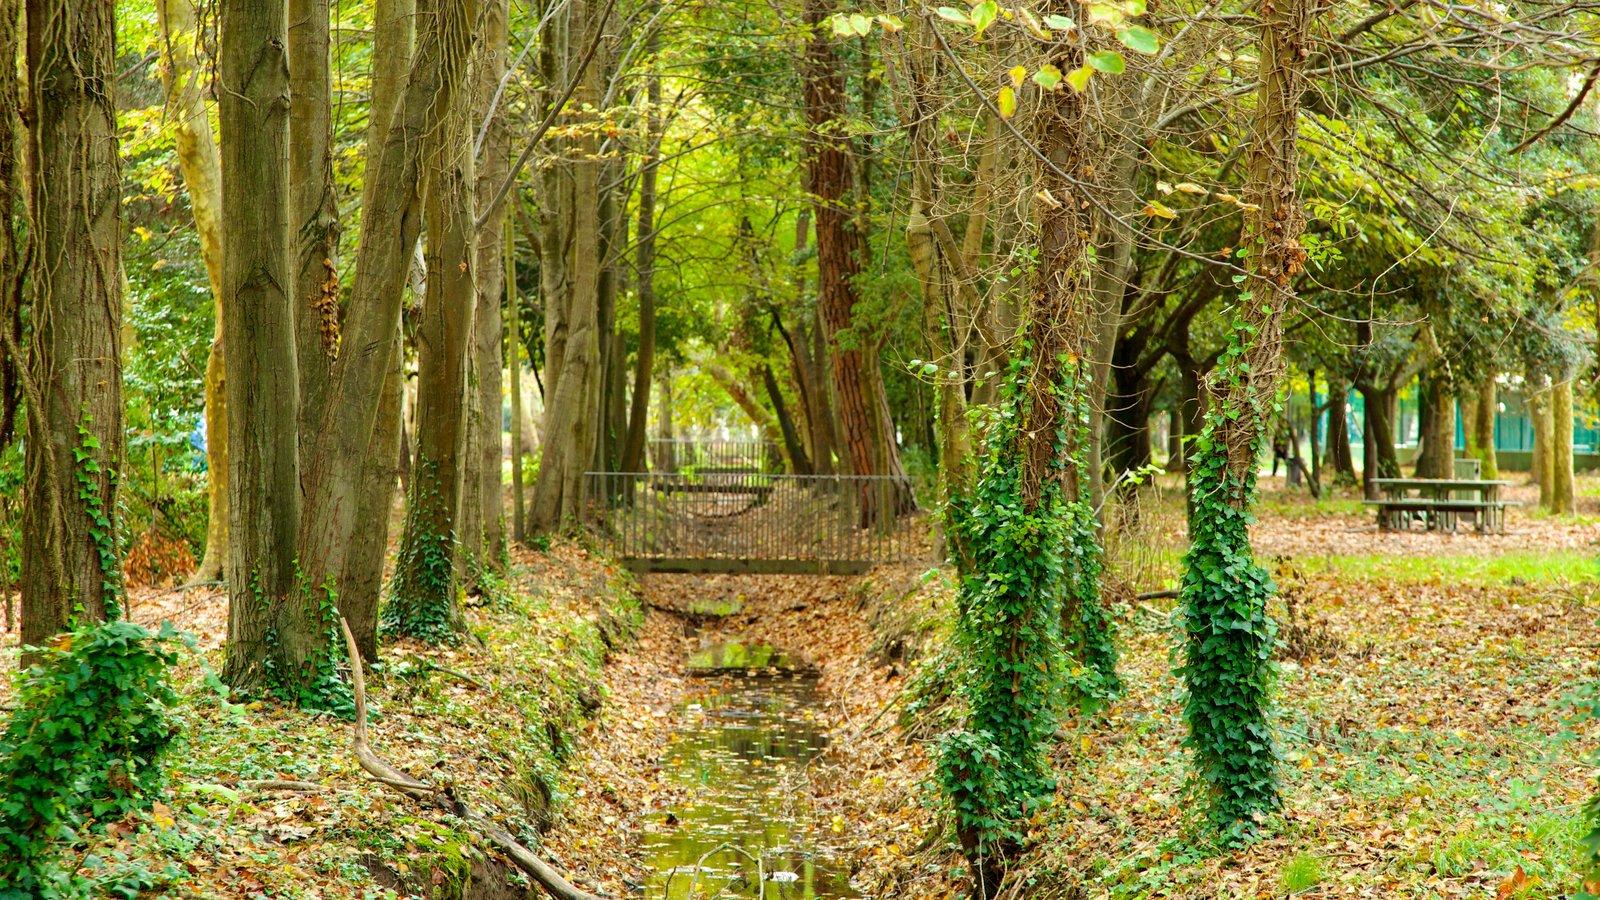 Pineta di Ponente featuring forests, a garden and a bridge